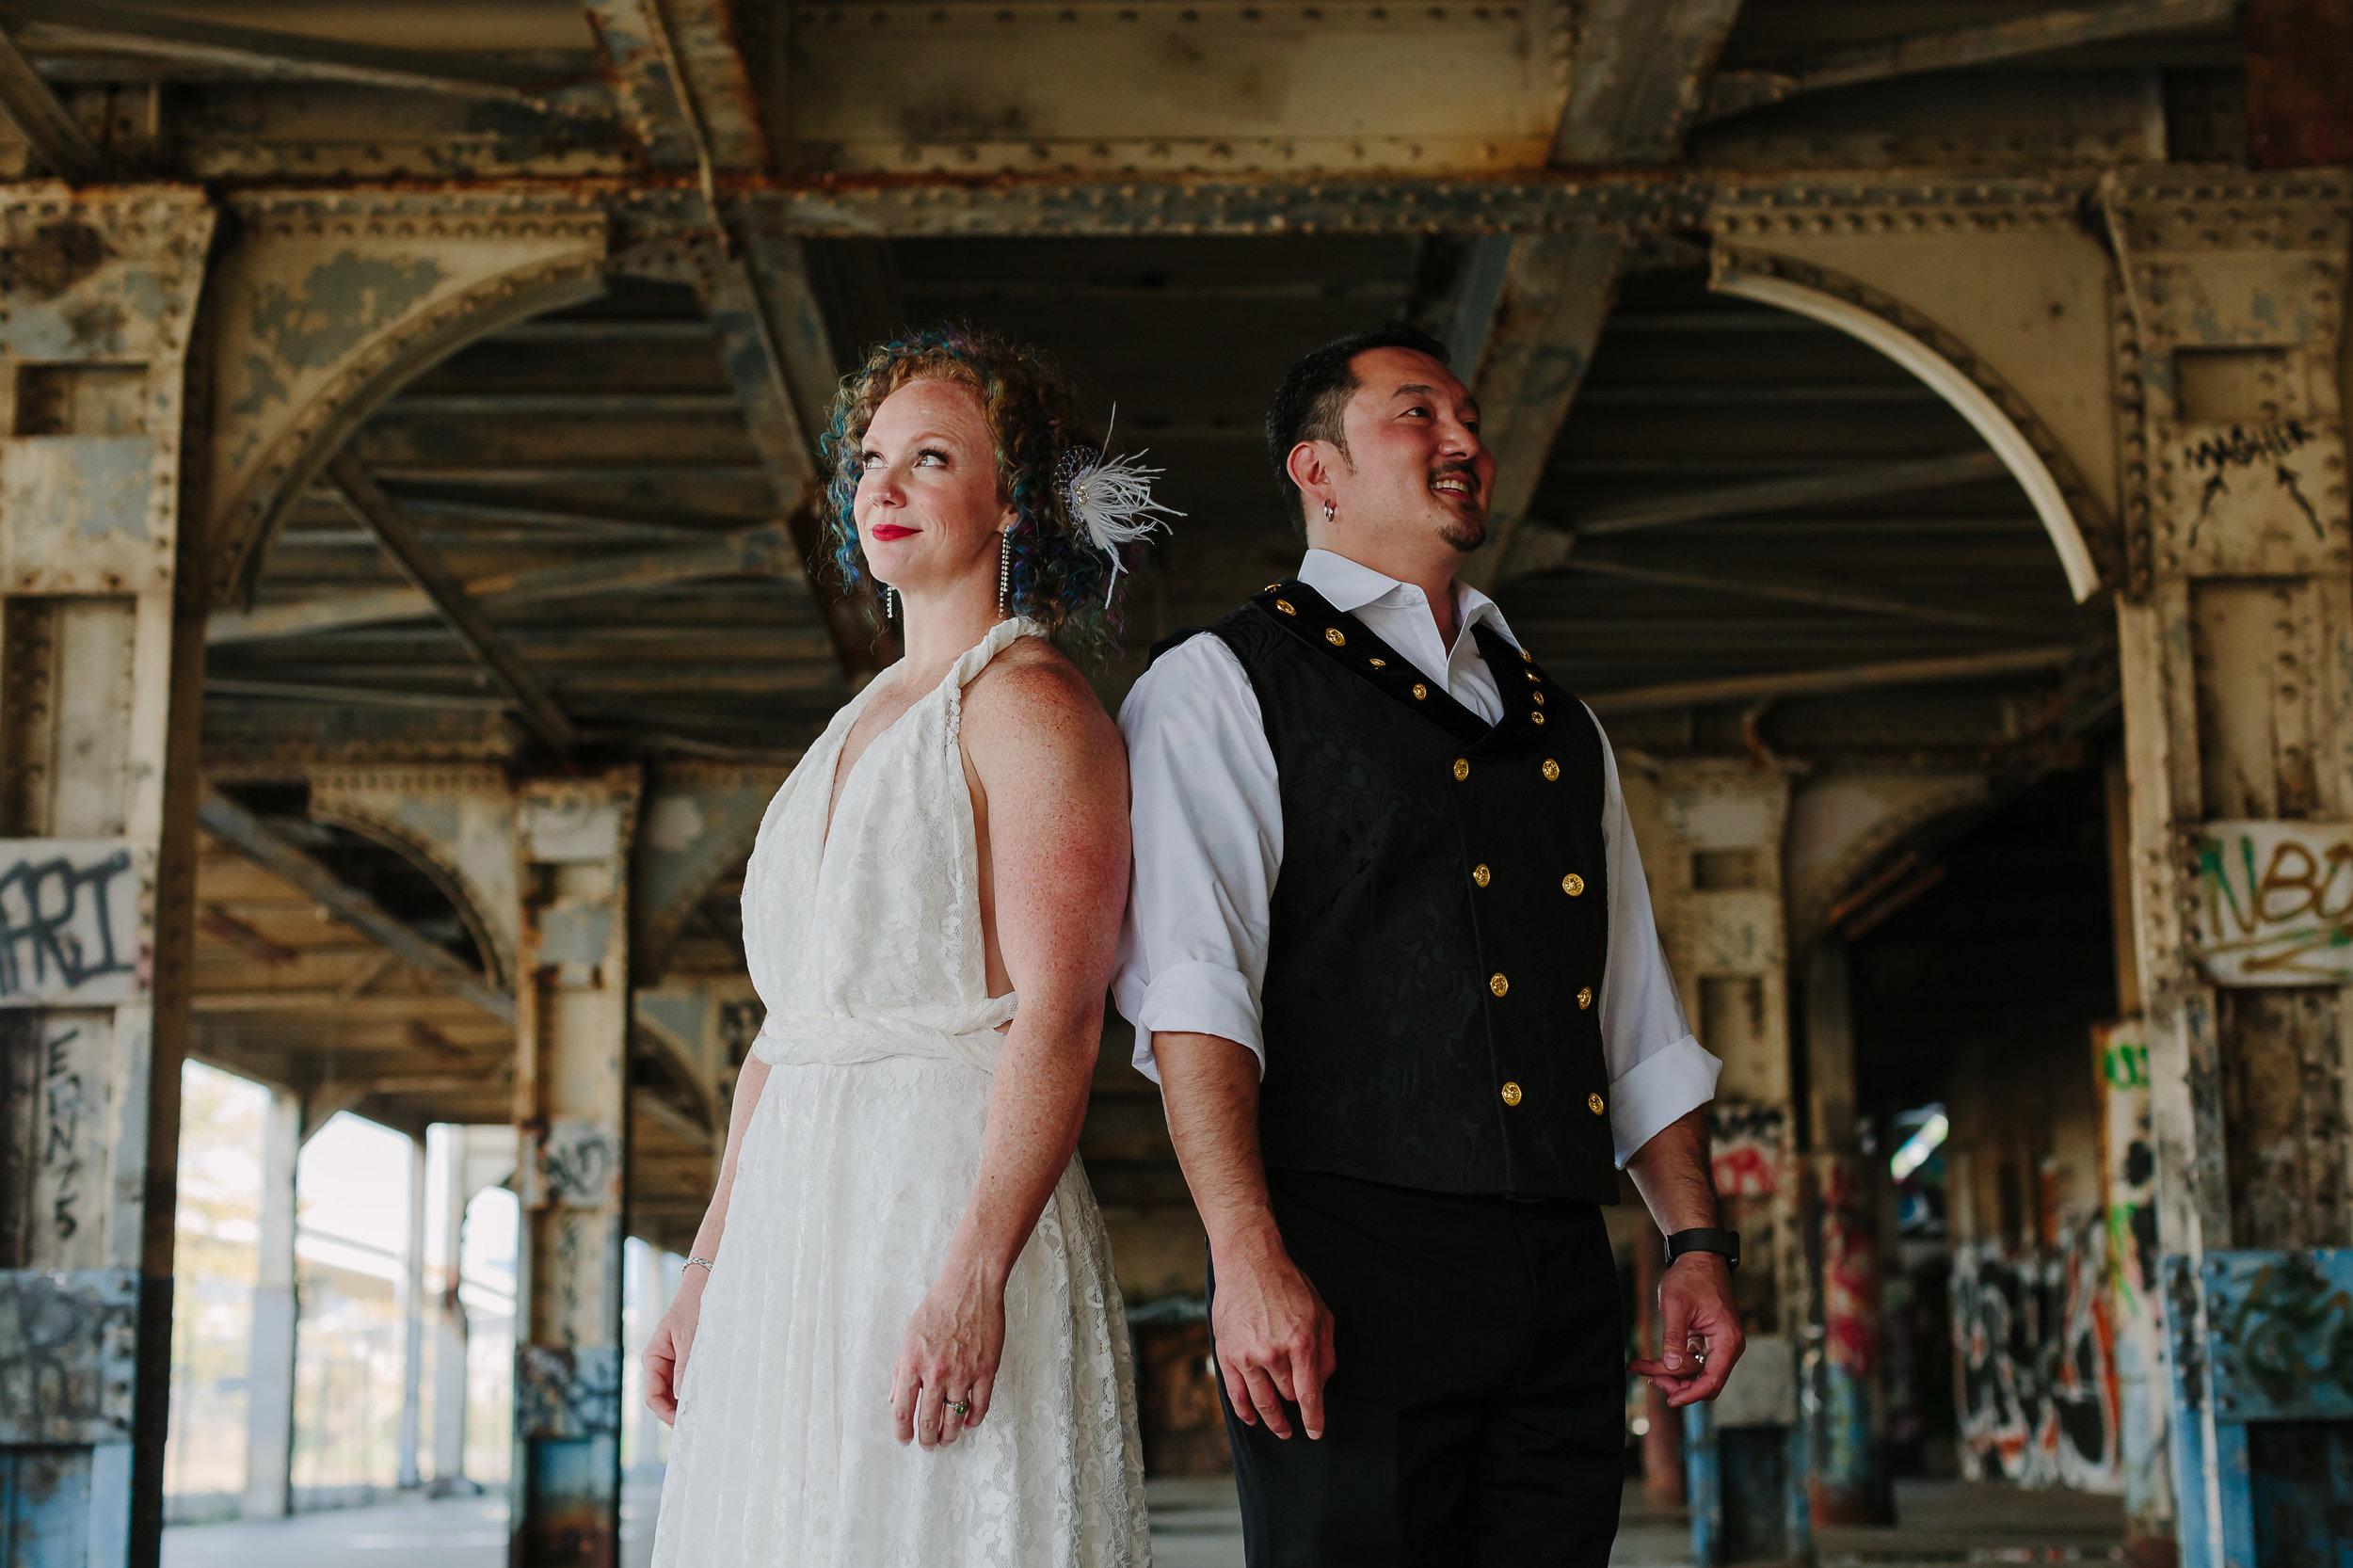 Kristin&MattWedding-0462.jpg